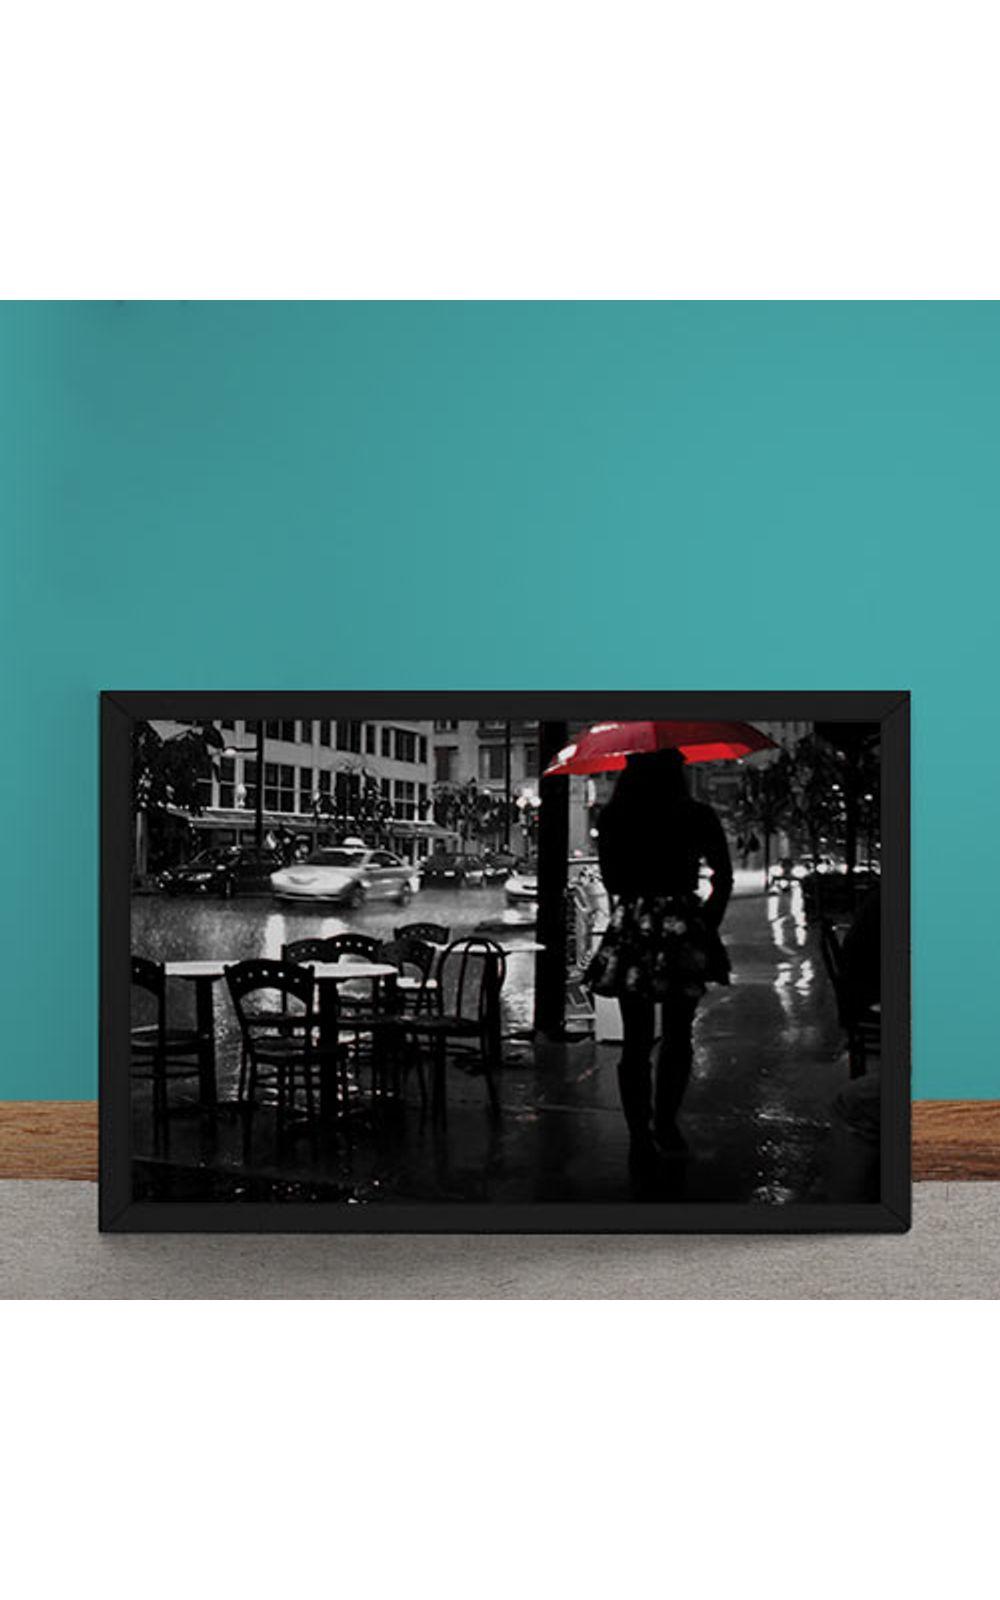 Foto 1 - Quadro Decorativo Noite Chuvosa Guarda Chuva Vermelho